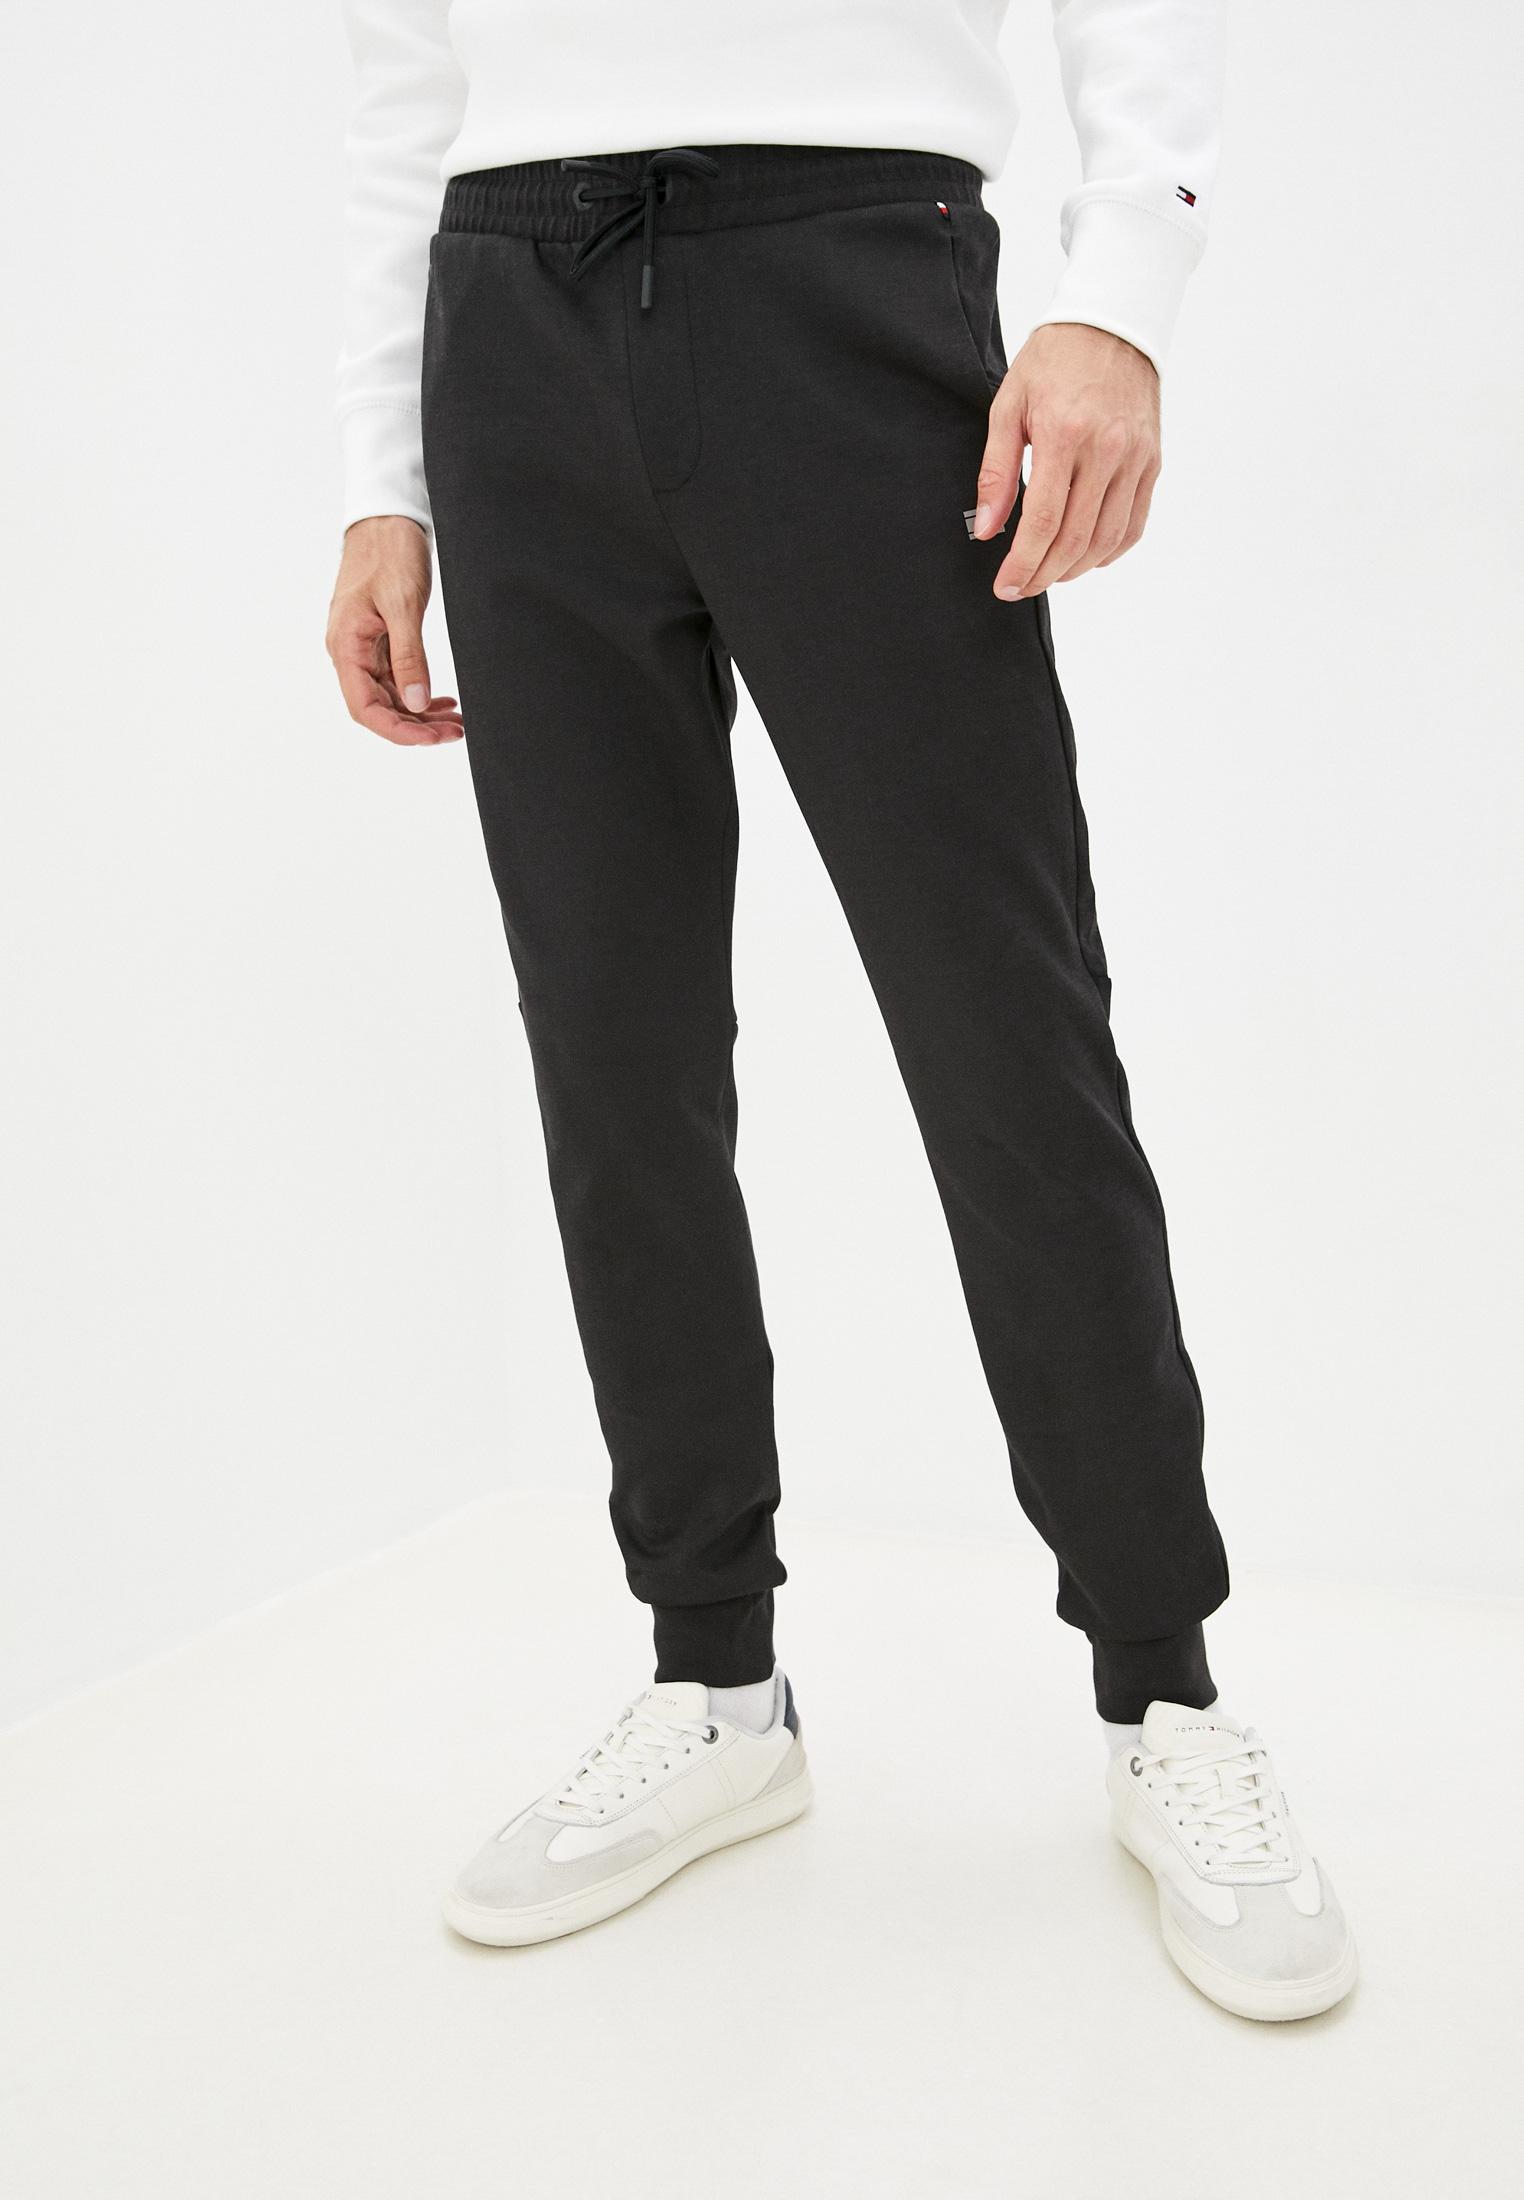 Мужские спортивные брюки Tommy Hilfiger (Томми Хилфигер) MW0MW19792